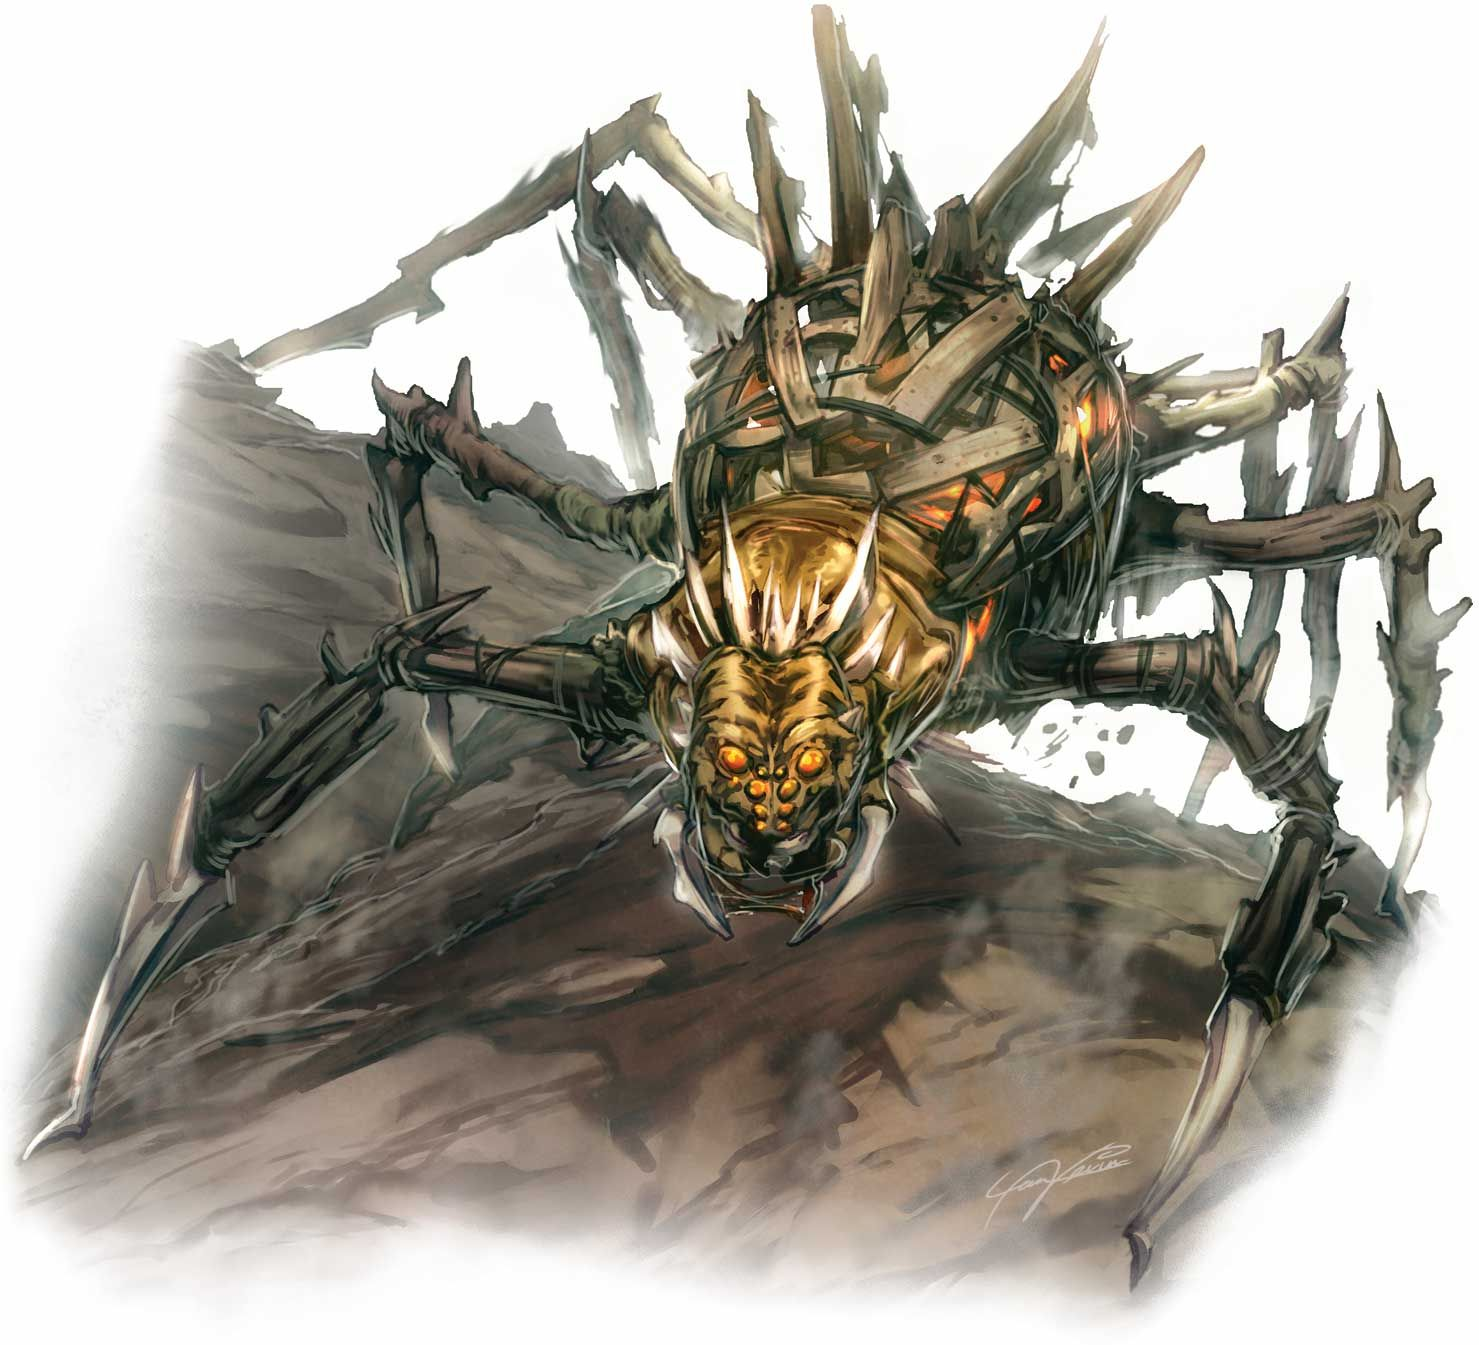 bilge spider - Google Search